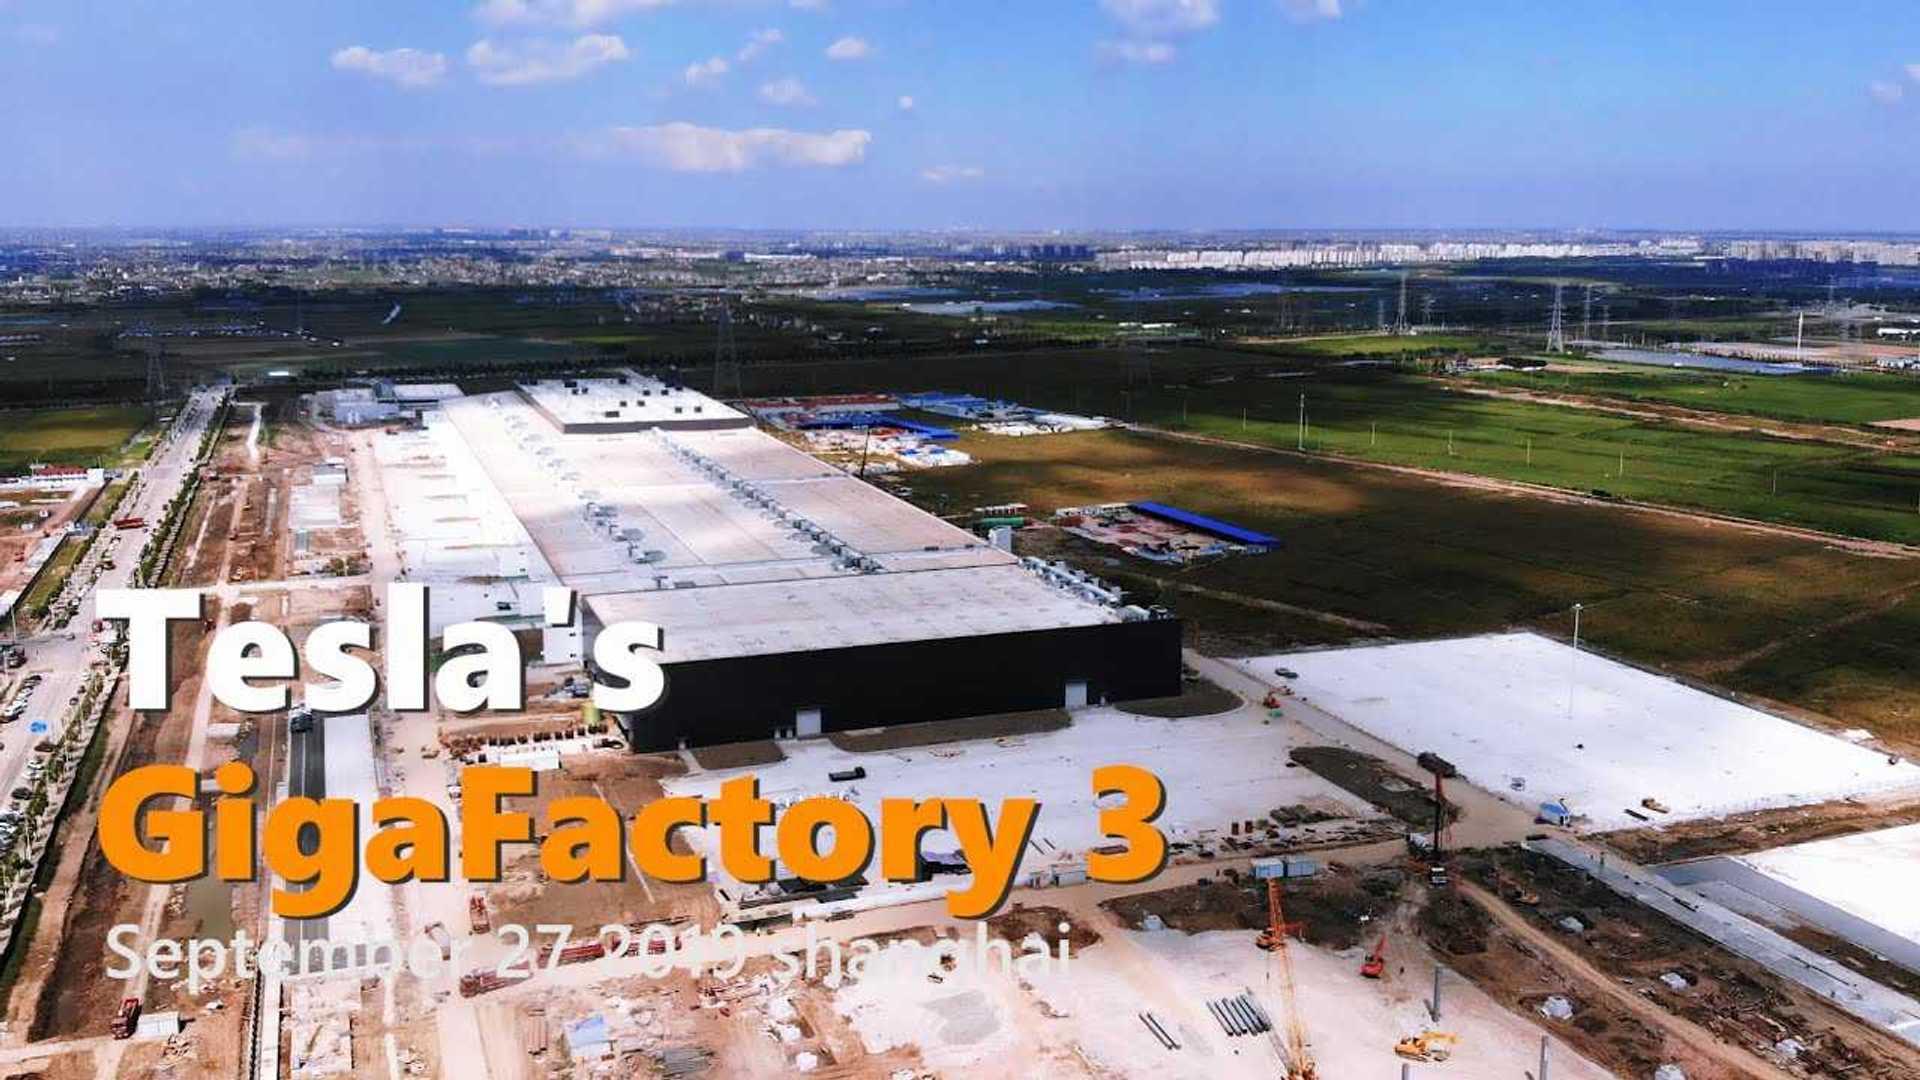 Has the struggling automaker's stock finally bottomed? Tesla Gigafactory 3 Construction Progress September 27